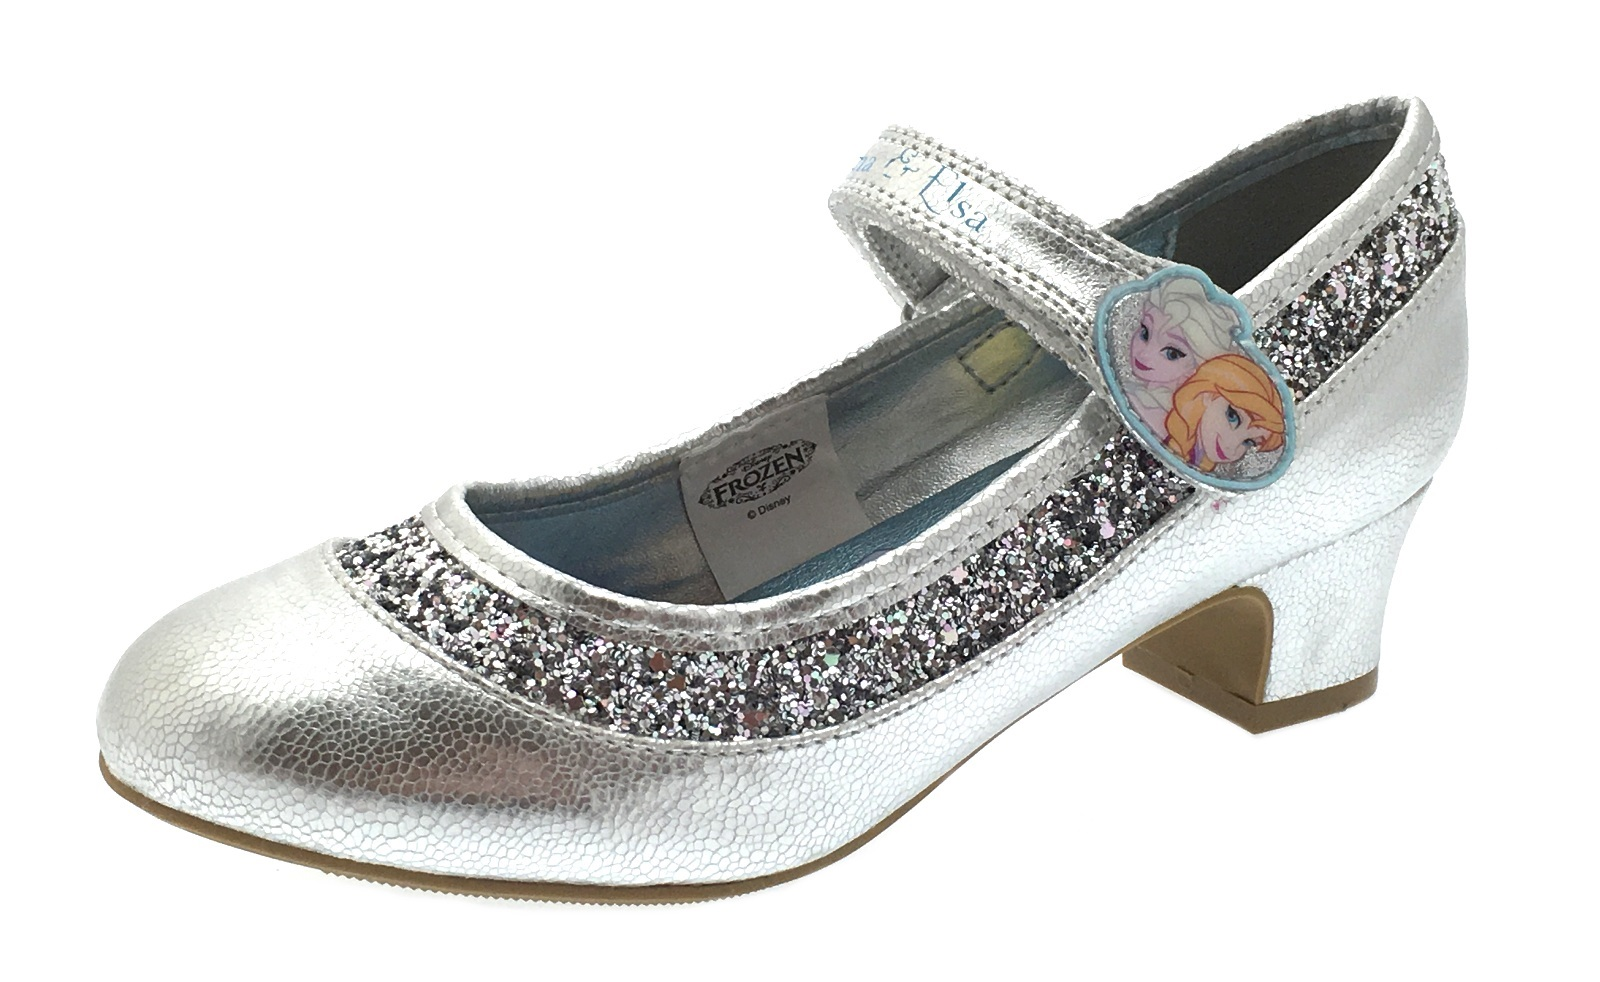 65da73d80df24 Details about Kids Girls Disney Frozen Dress Up Shoes Glitter Princess Low  Heels Party Size